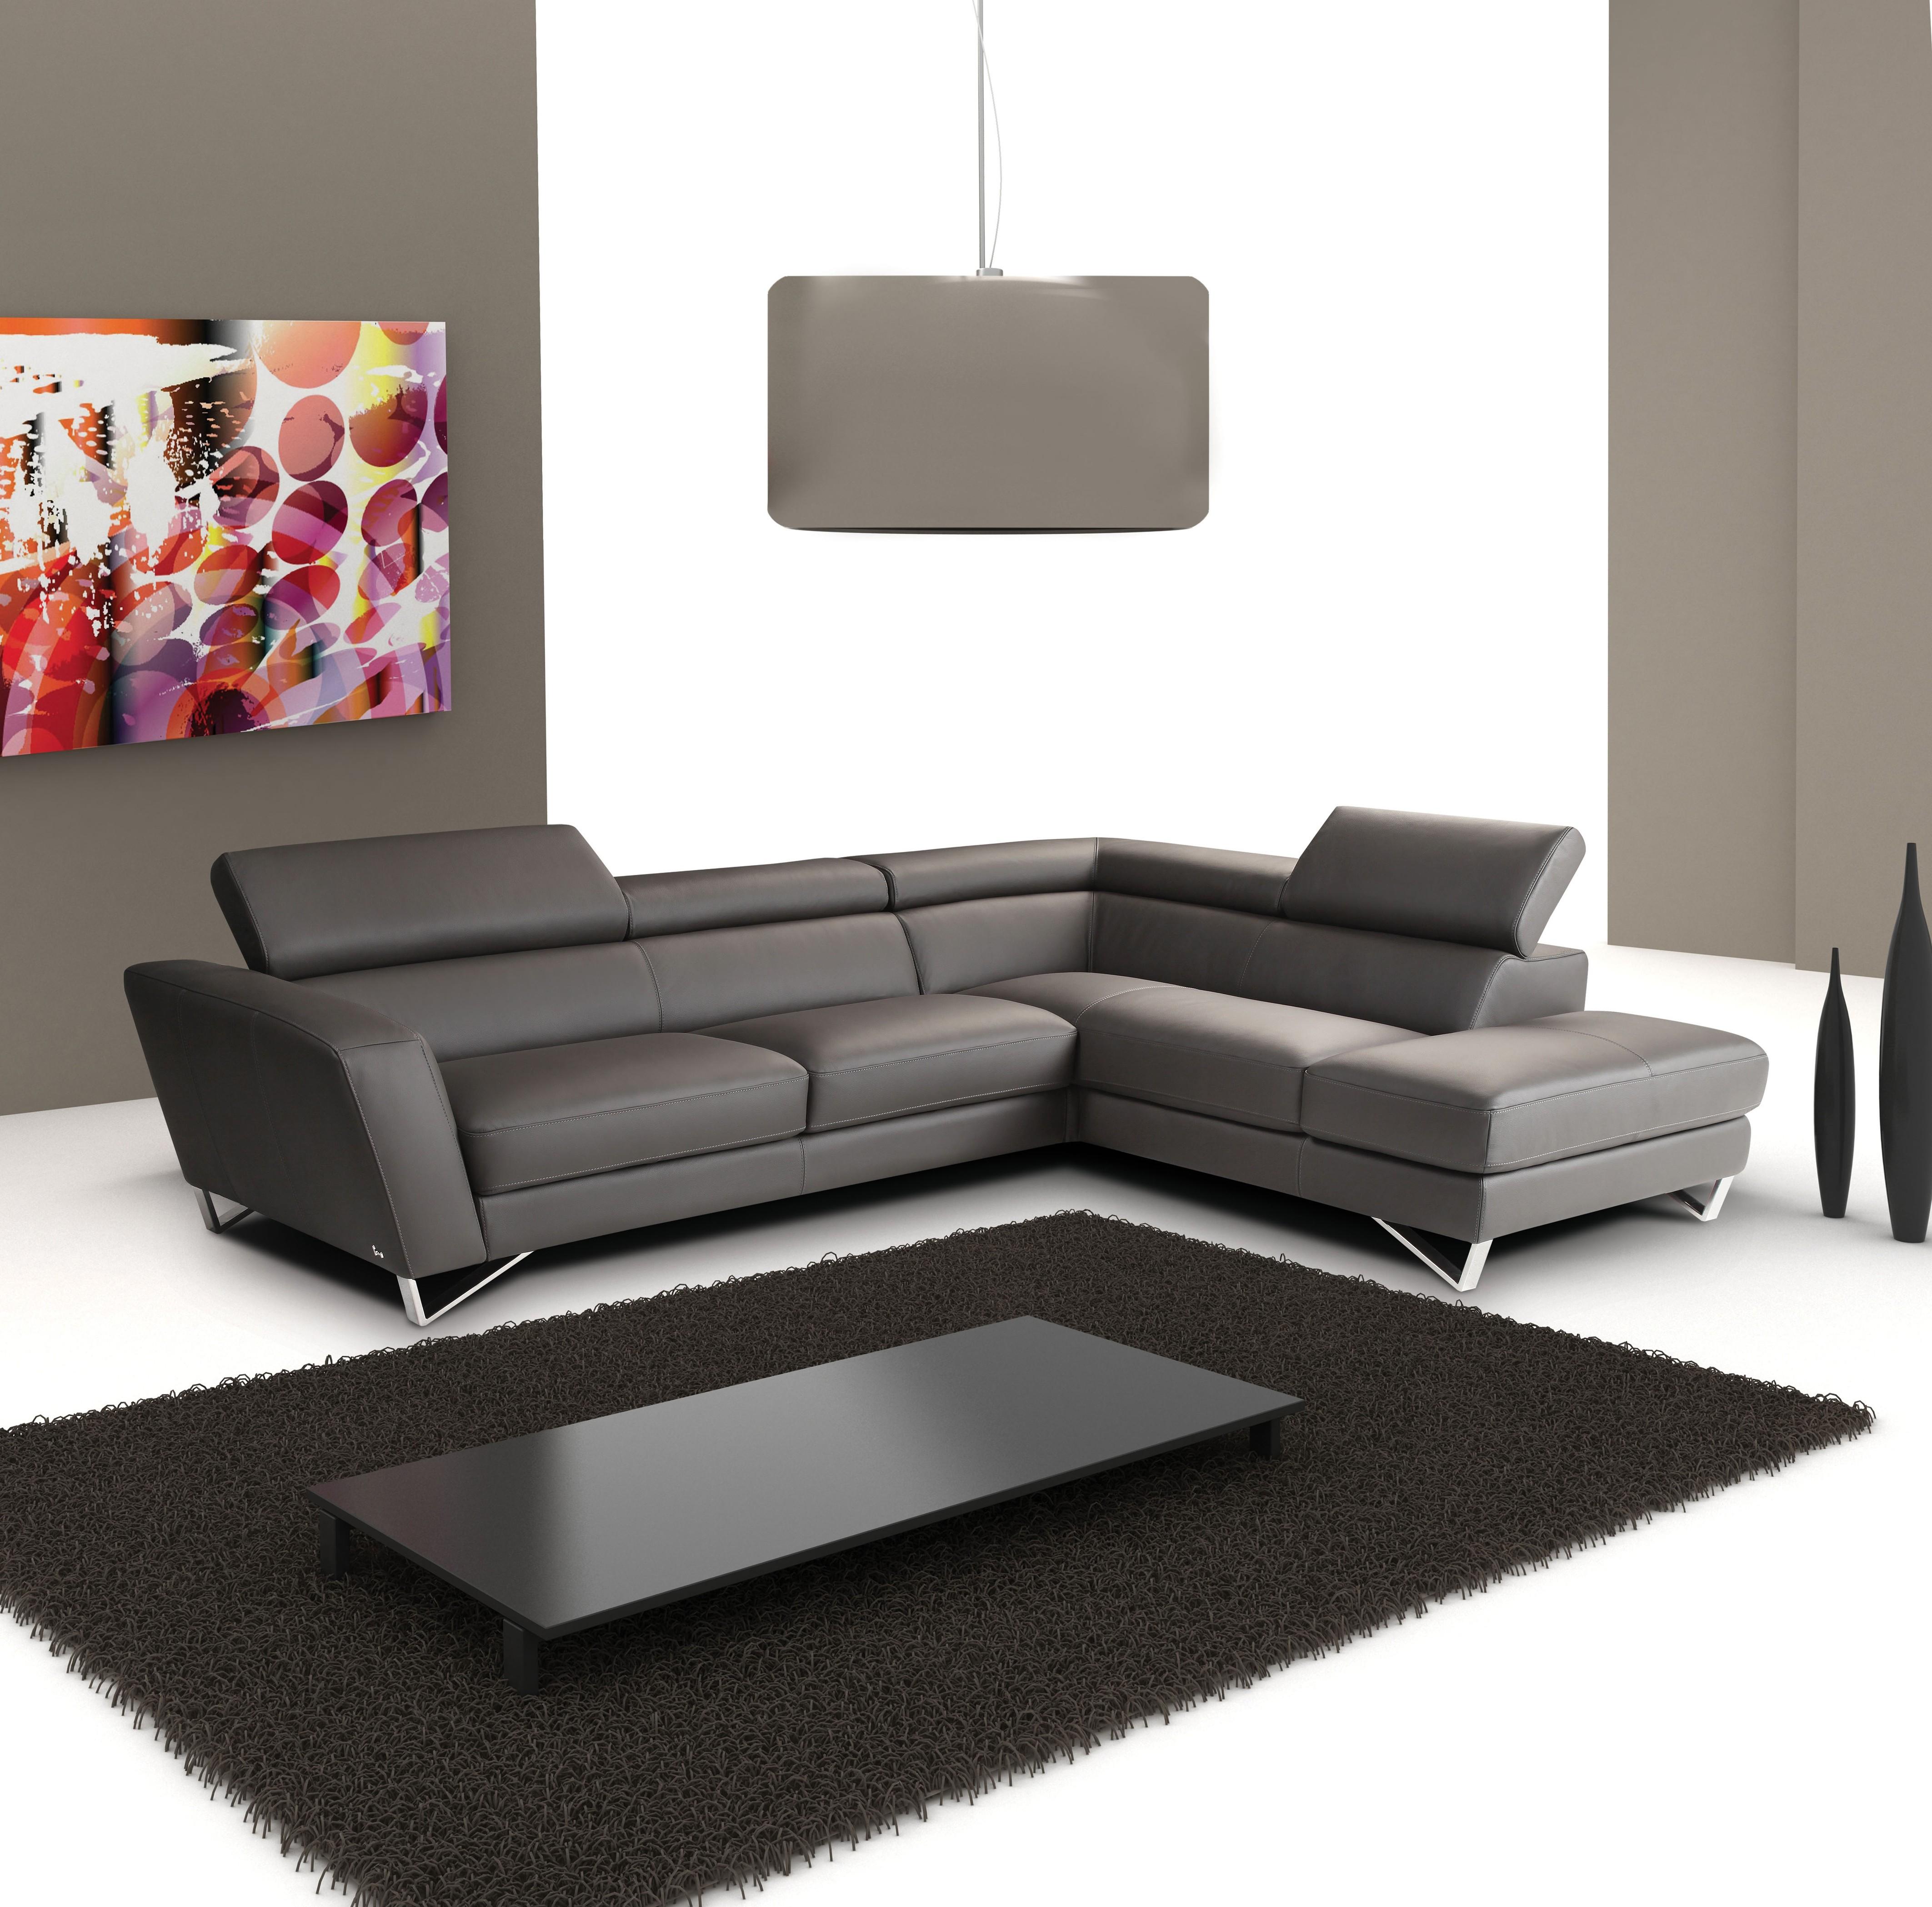 Ashley Furniture Edison Nj: Modern Furniture Wholesale > • Premium